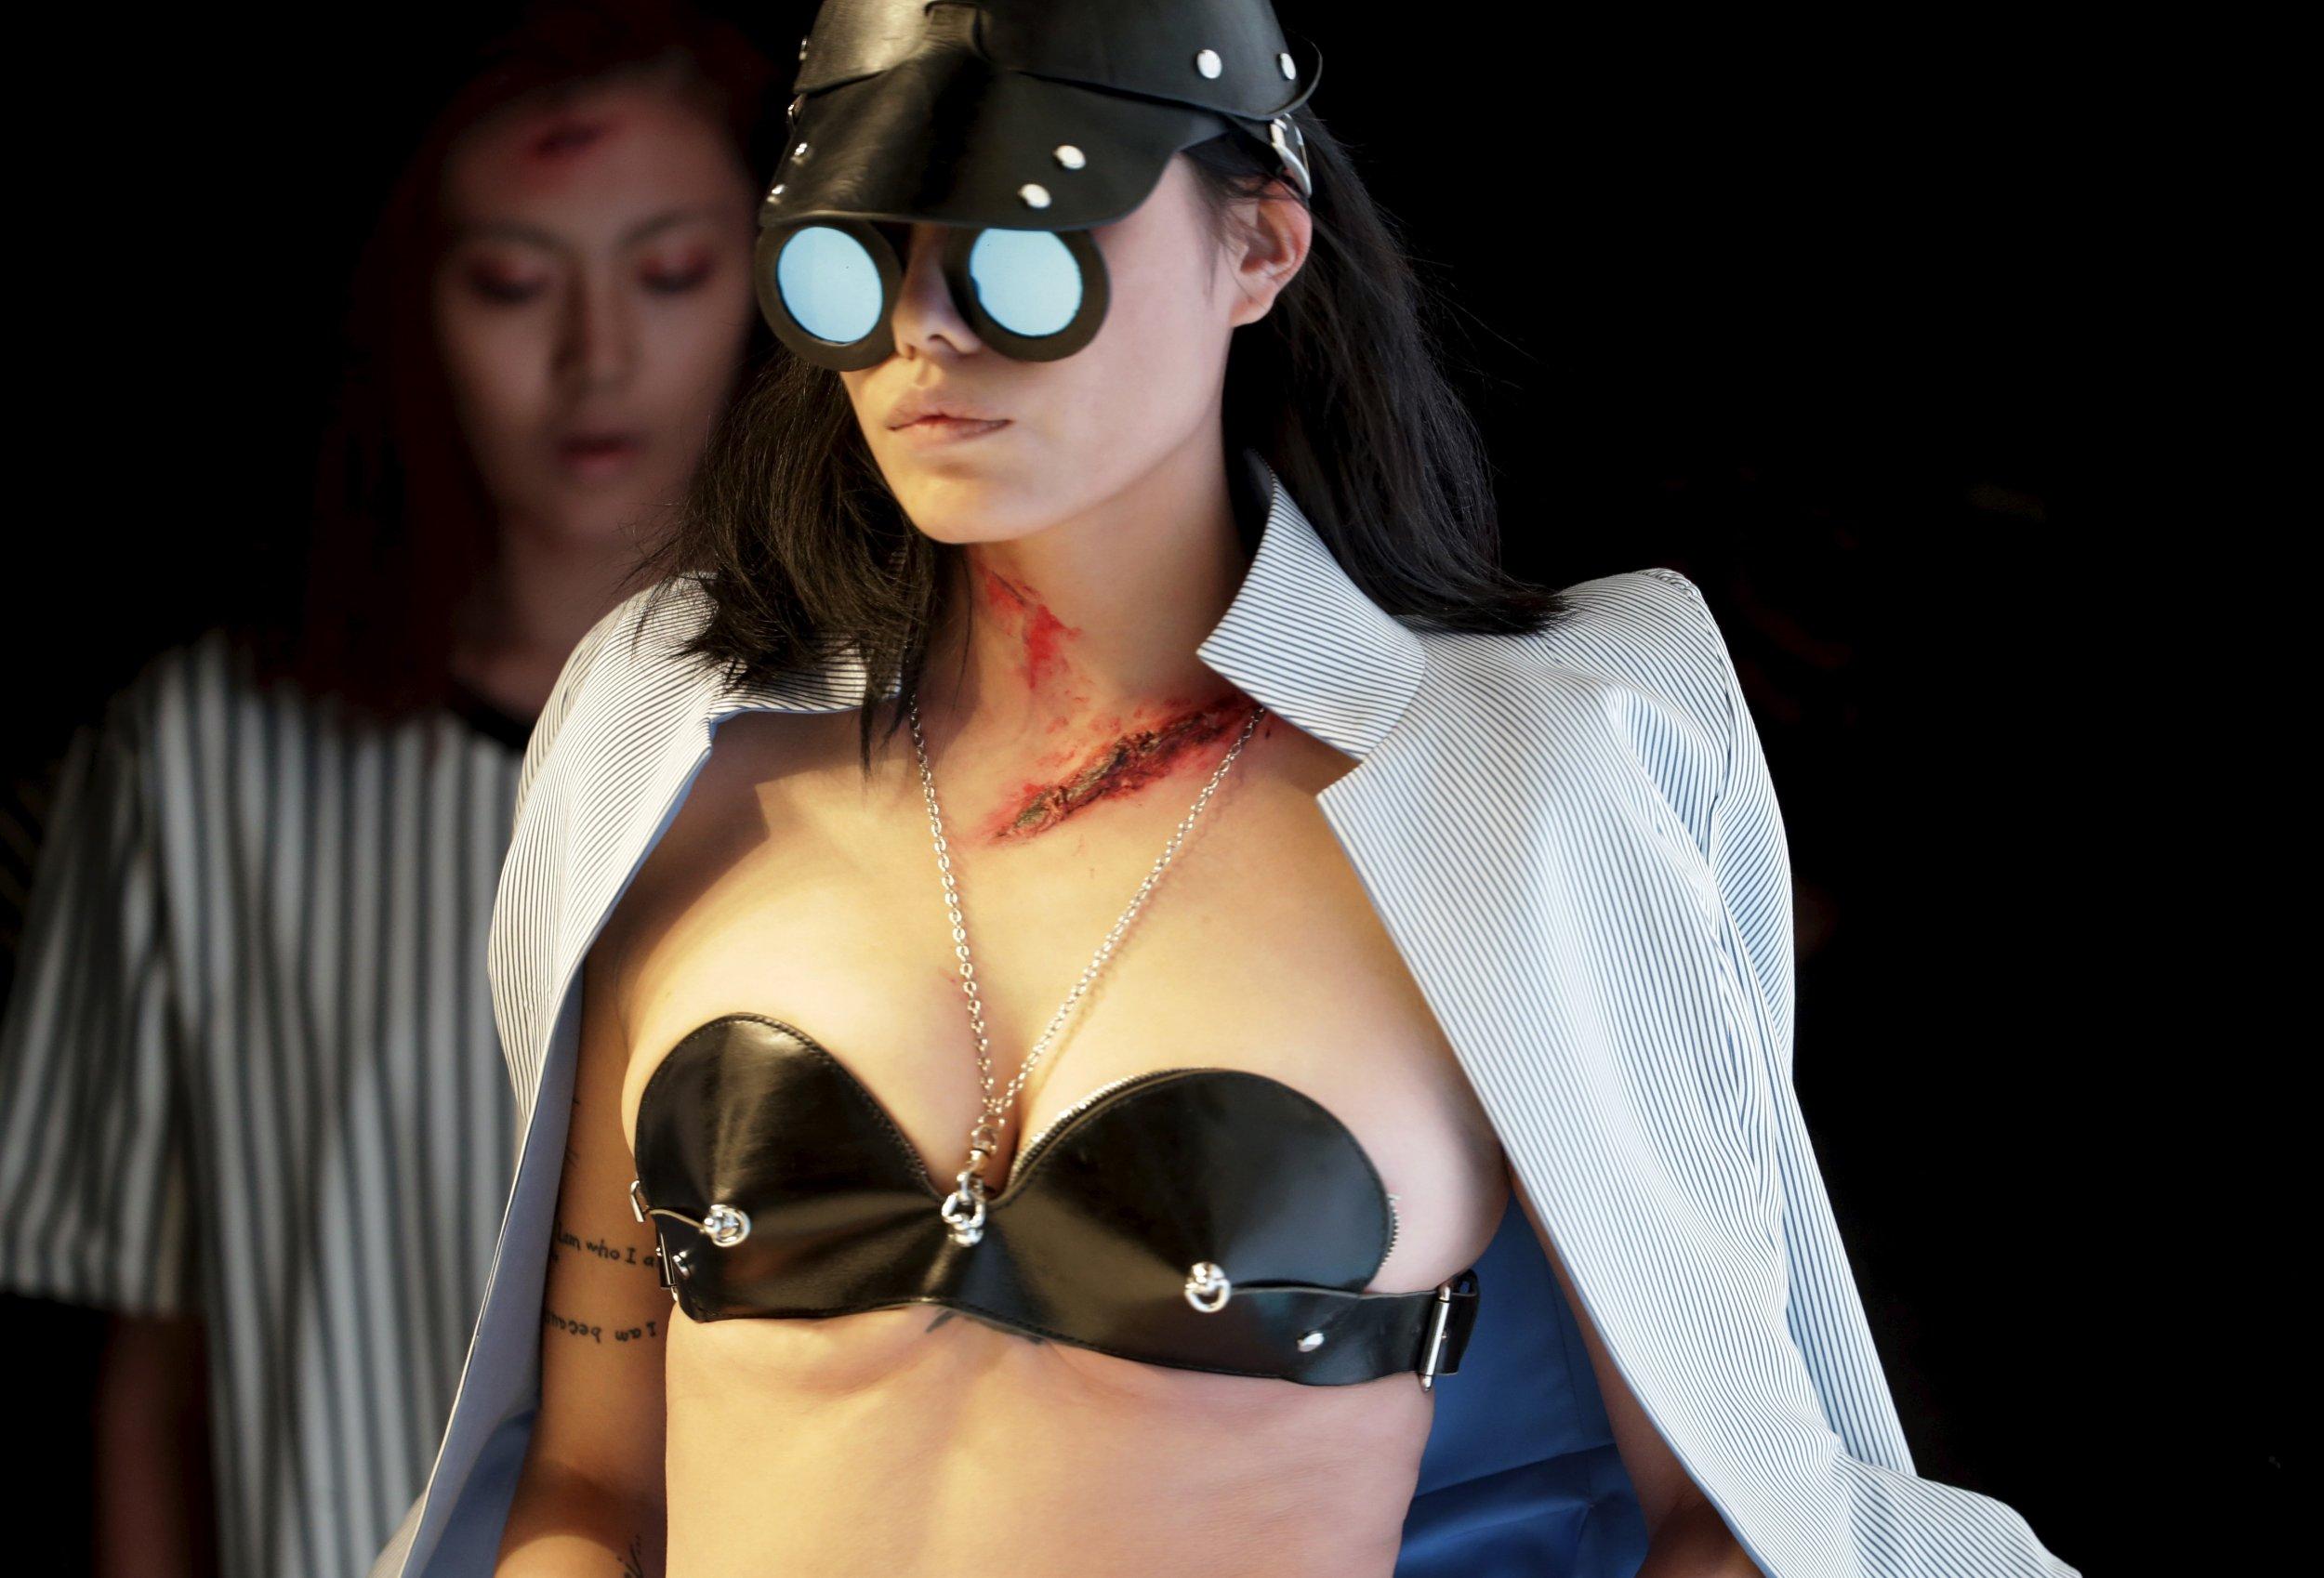 05_15_China_Sex_01